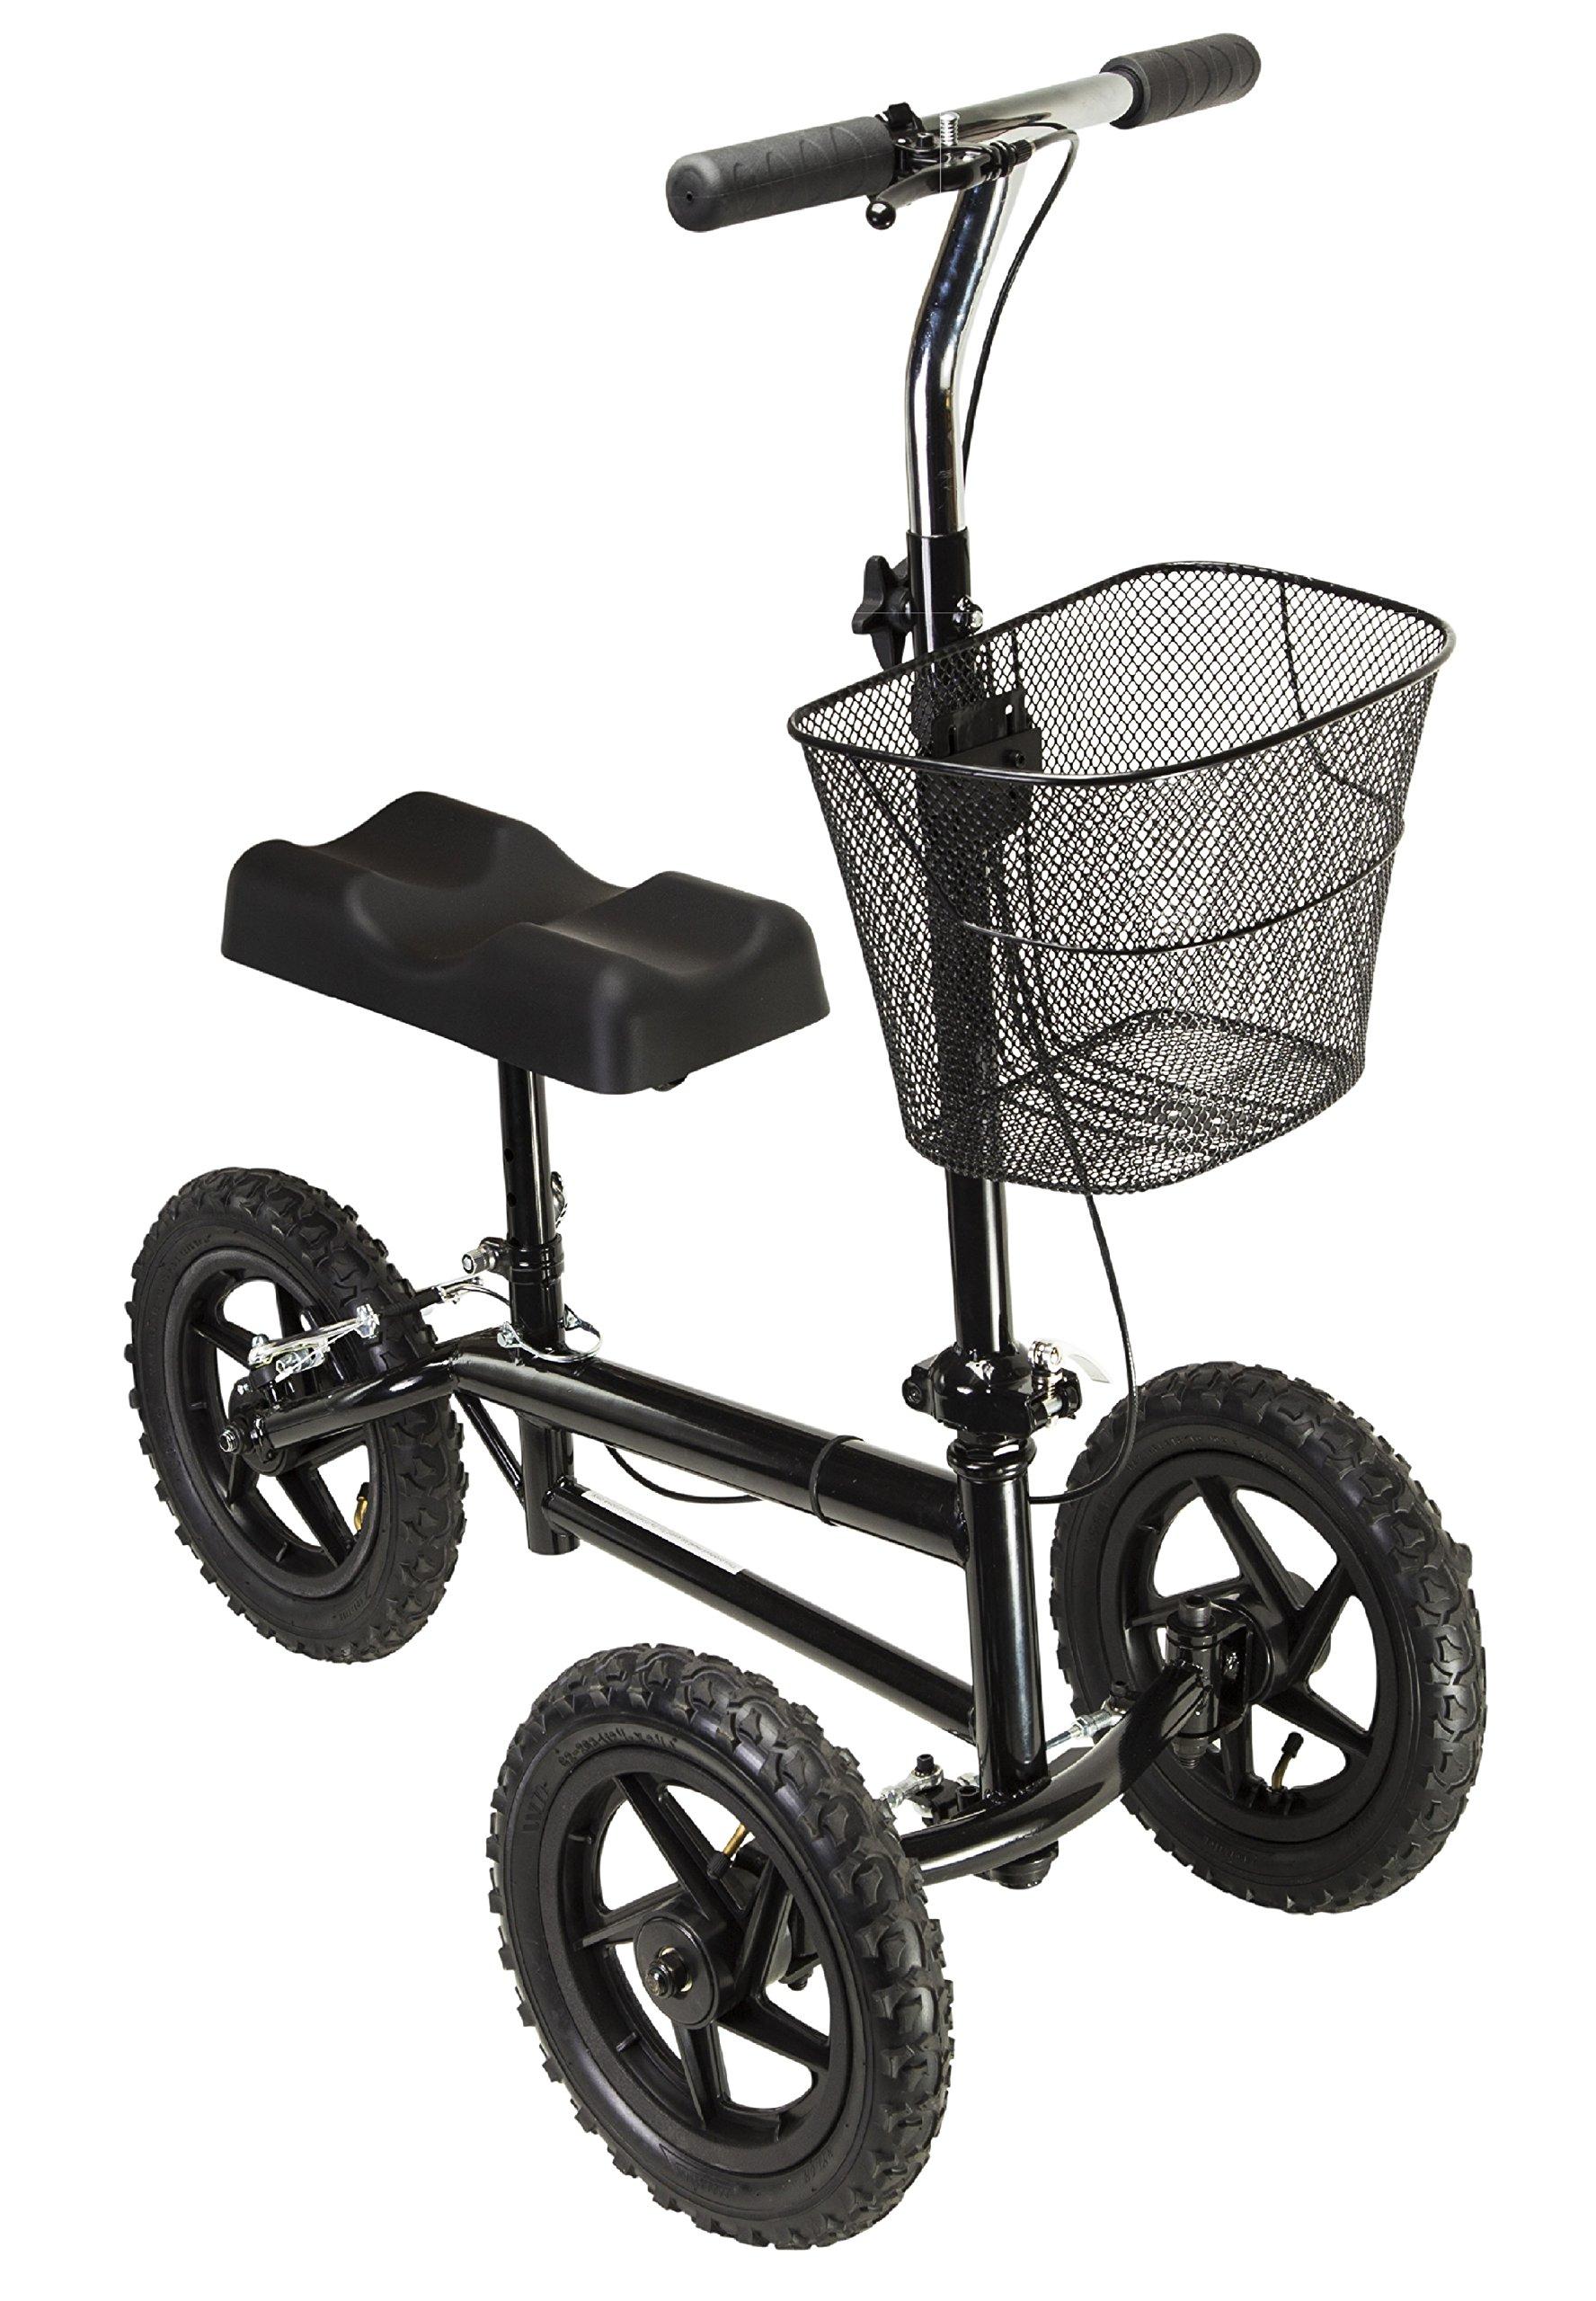 Azoob All Terrain Steerable Knee Walker Knee Scooter Crutches Alternative Super Duty 12'' Pneumatic Wheels